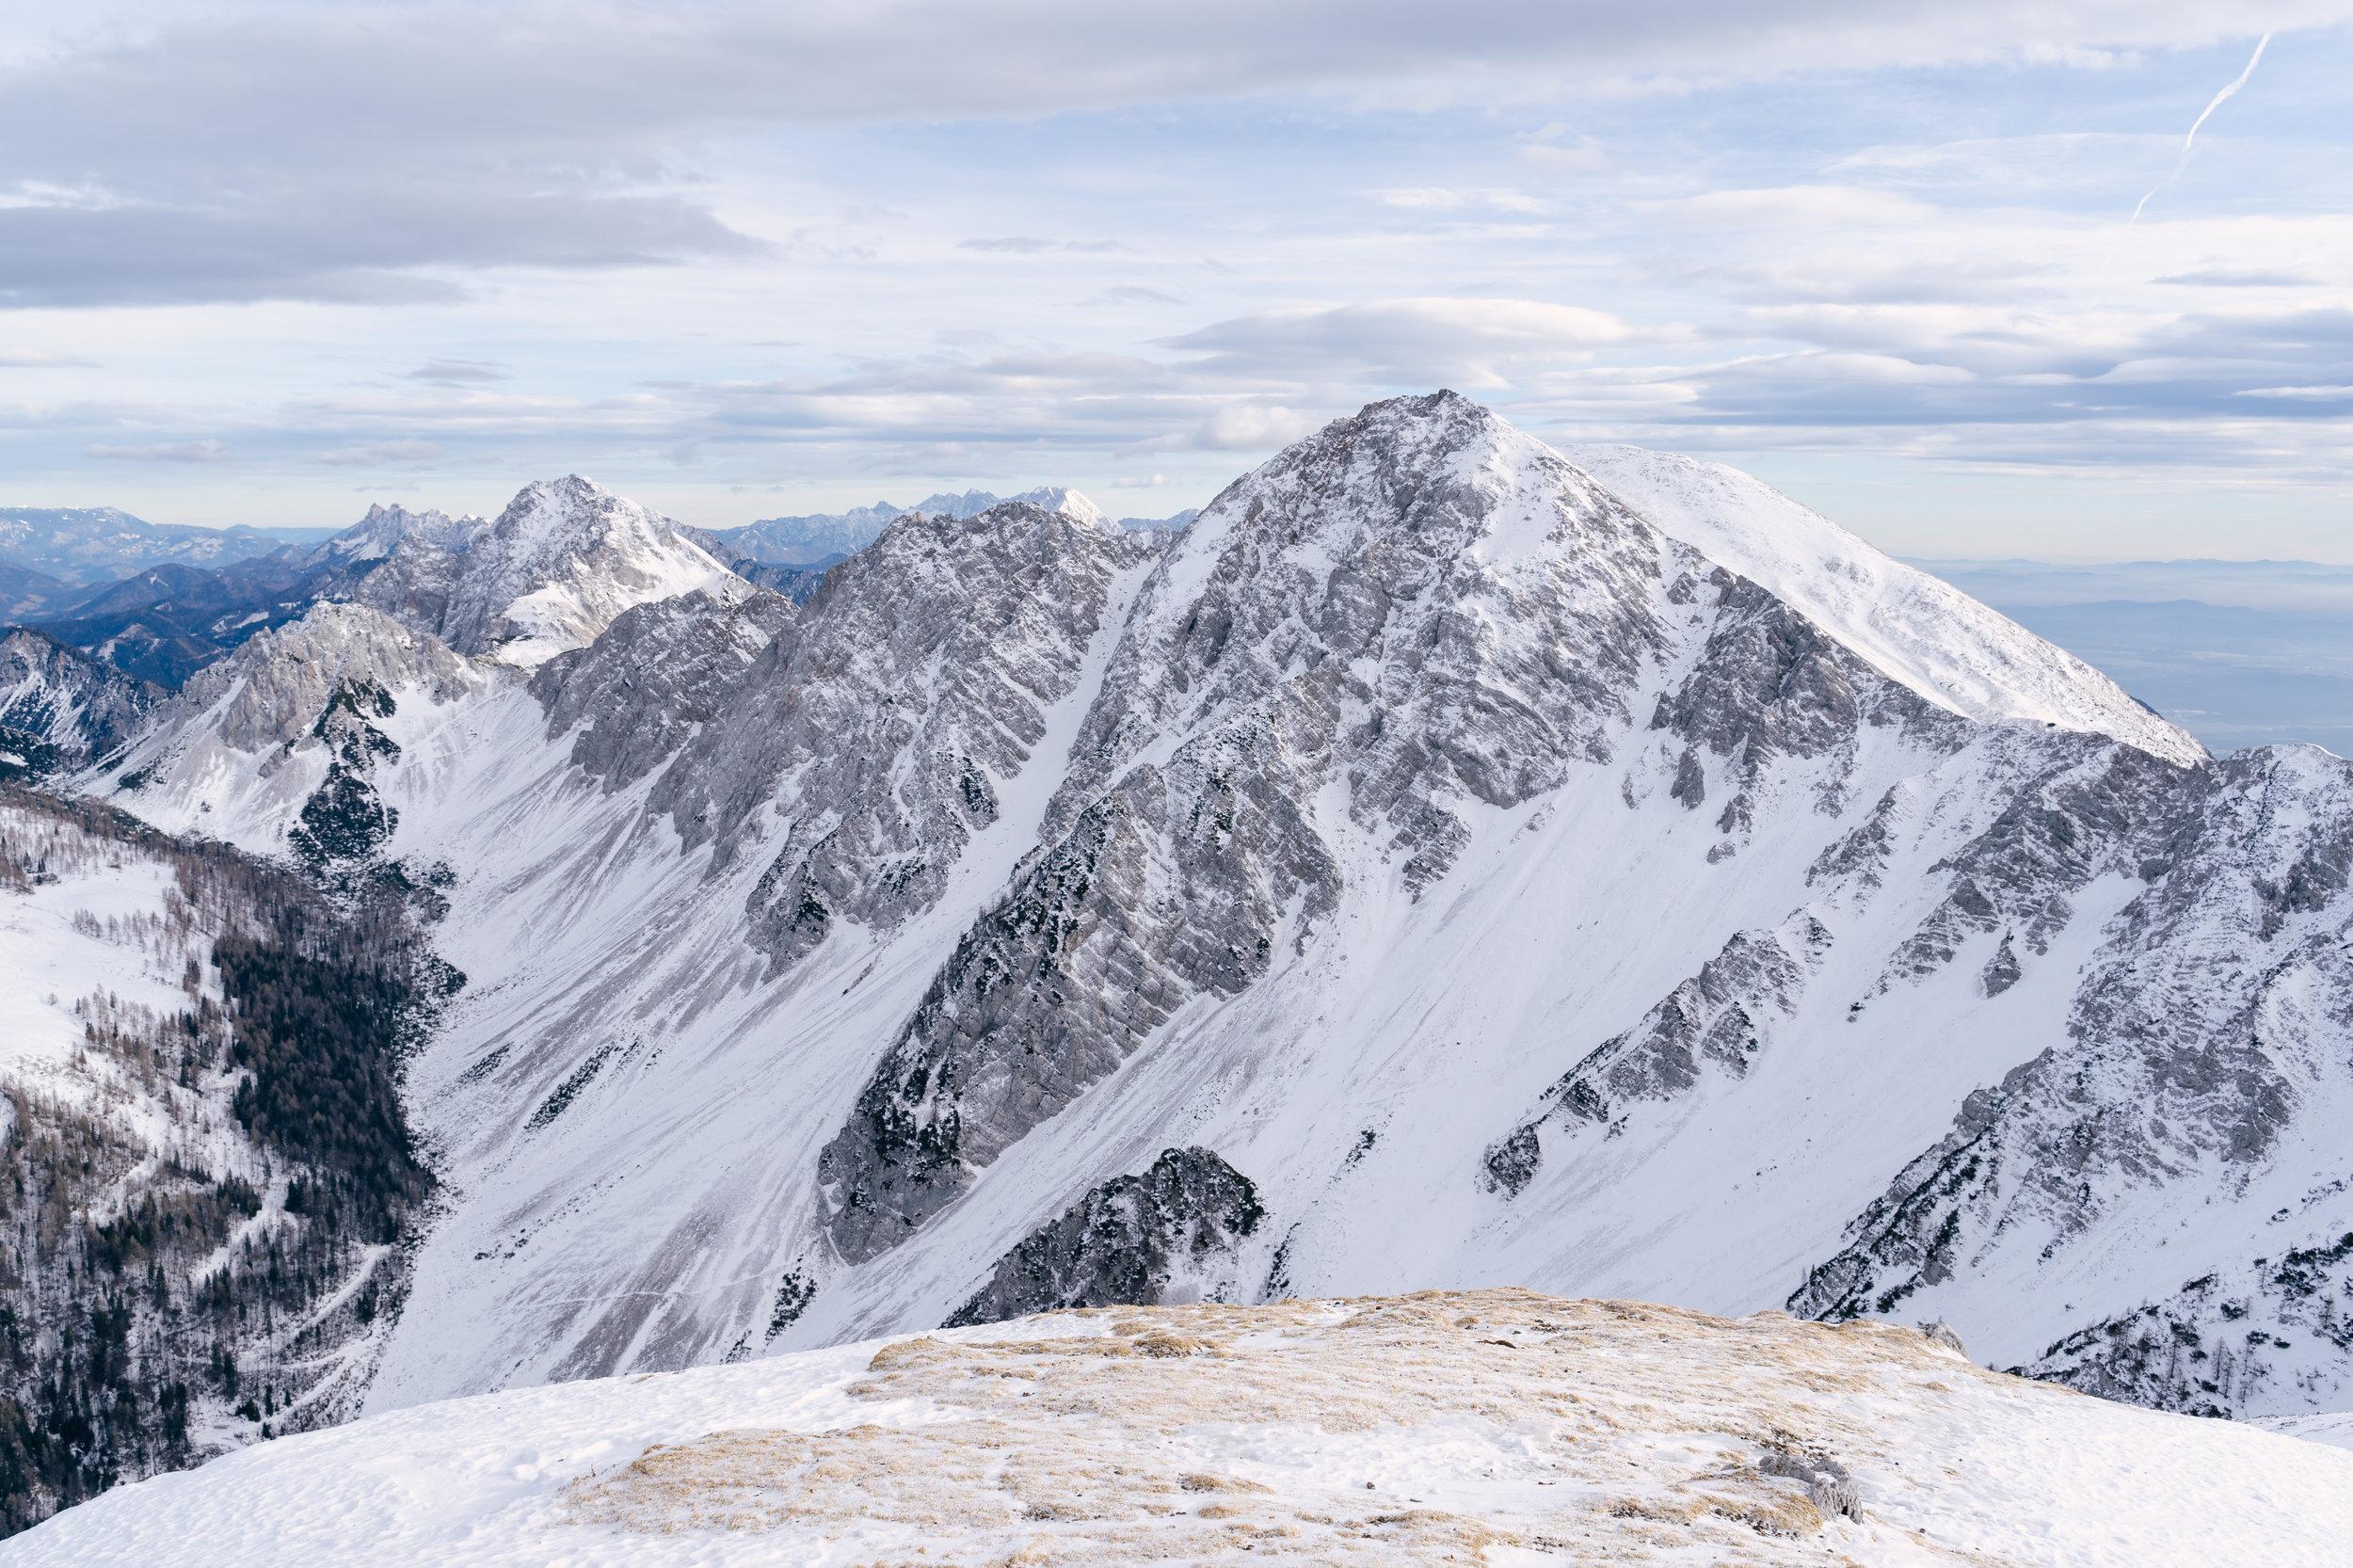 Mount Stol (2236 m), the highest peak of the Karawanks.